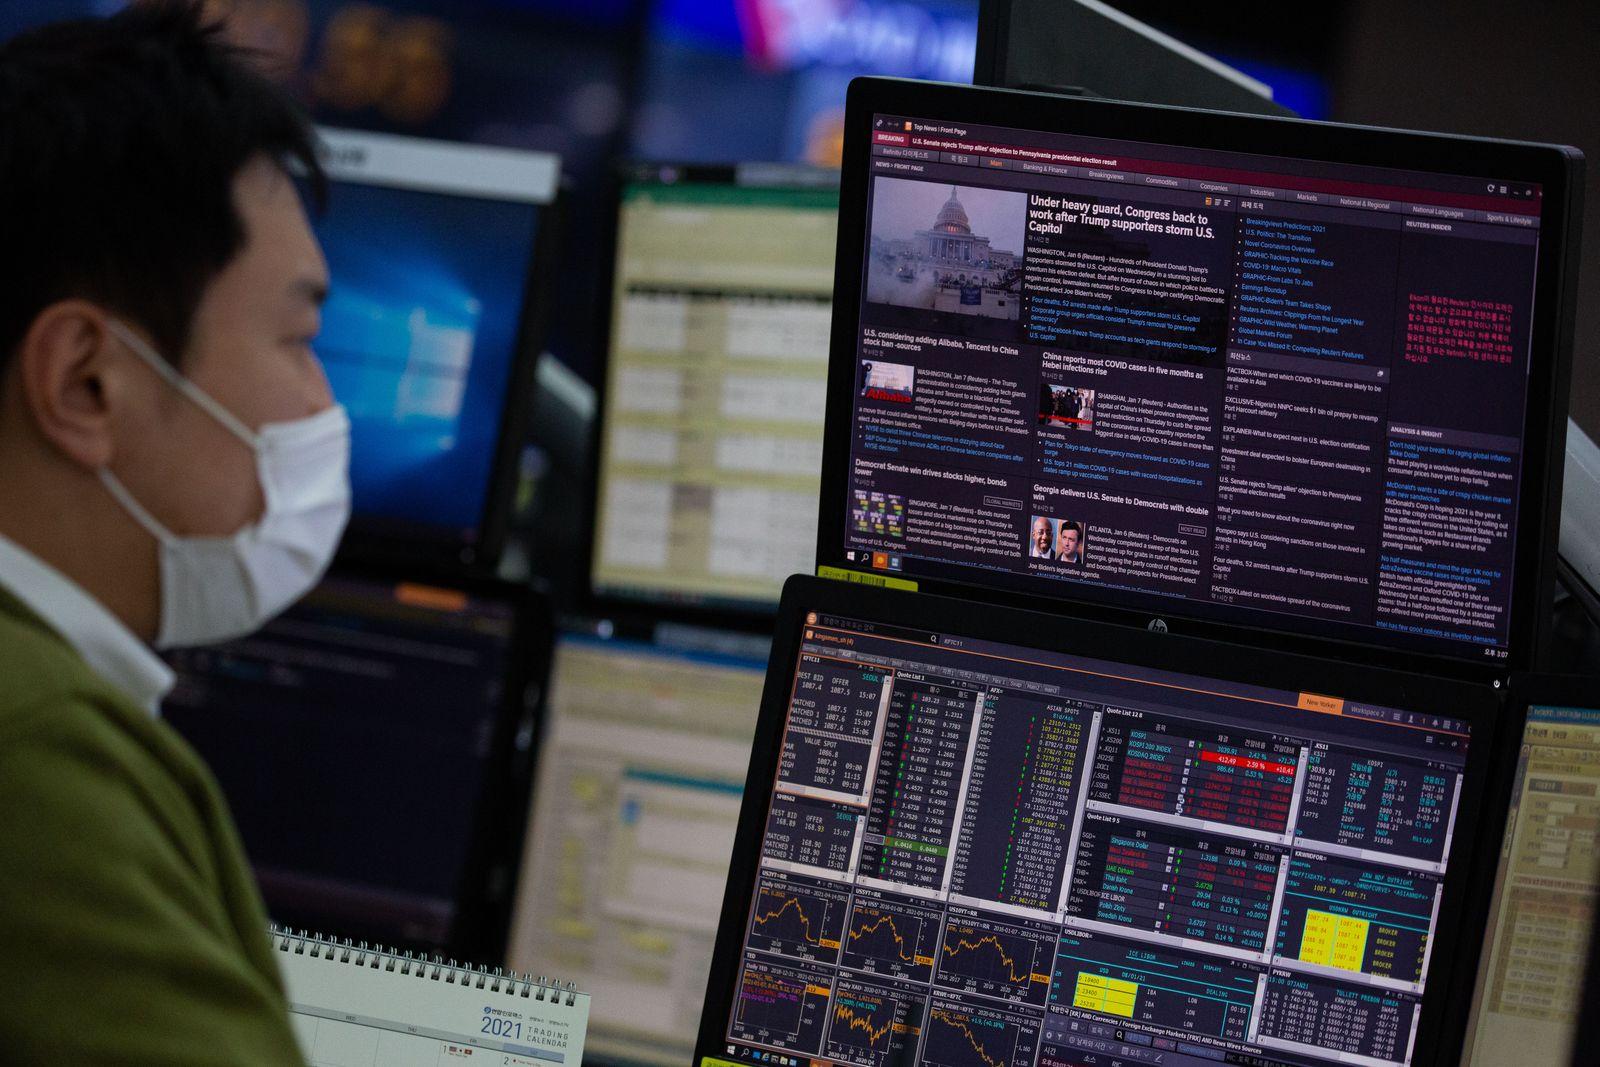 Stock market rose in South Korea, Seoul, Republic Of - 07 Jan 2021